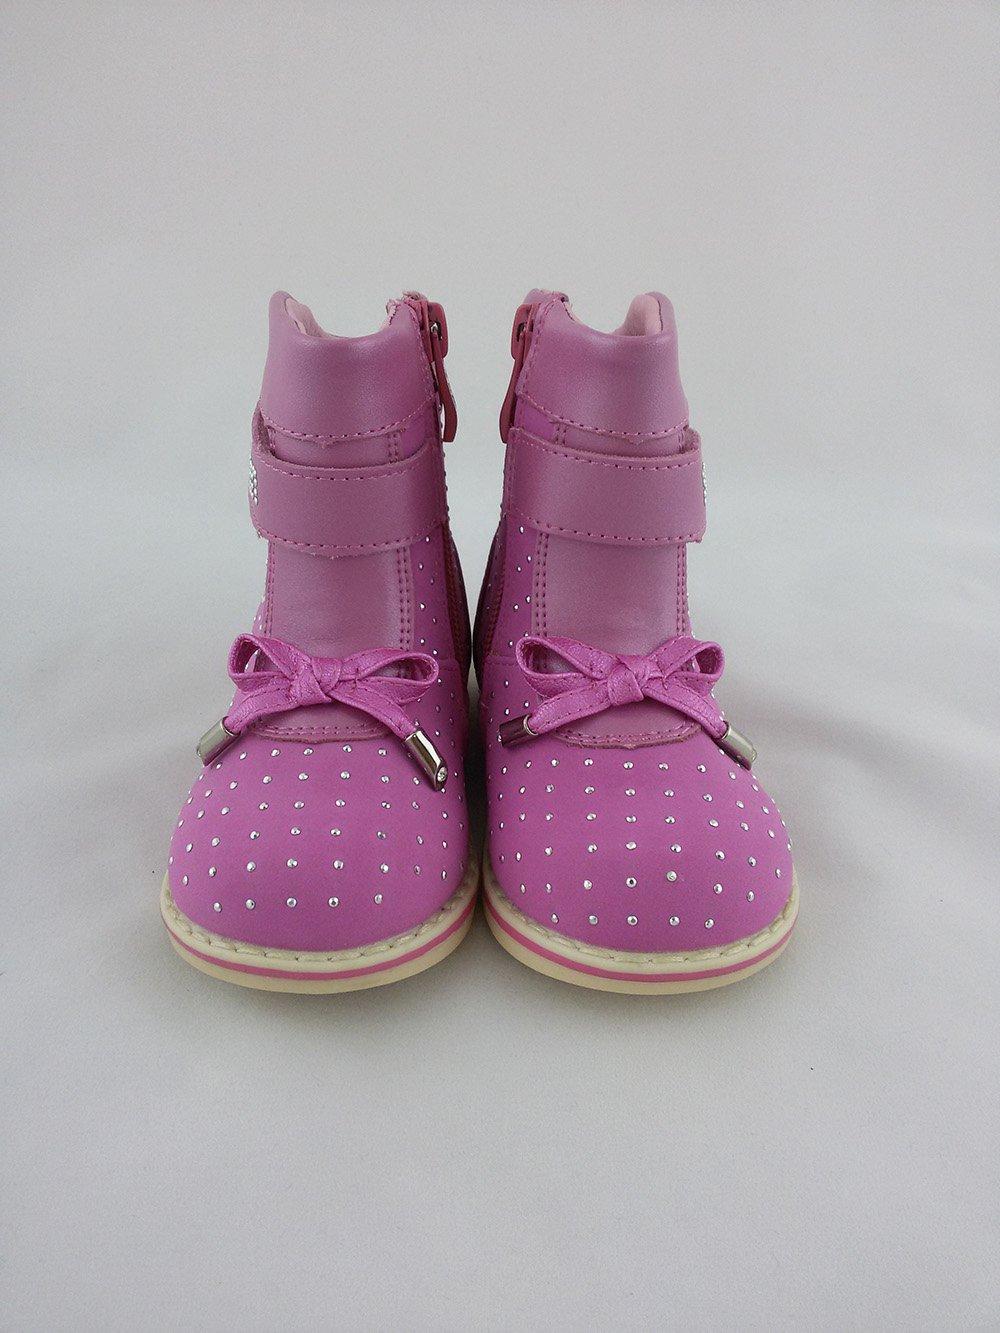 a411f06f7 Ботинки для девочки Tоm.m от интернет-магазина Сандалики в Екатеринбурге